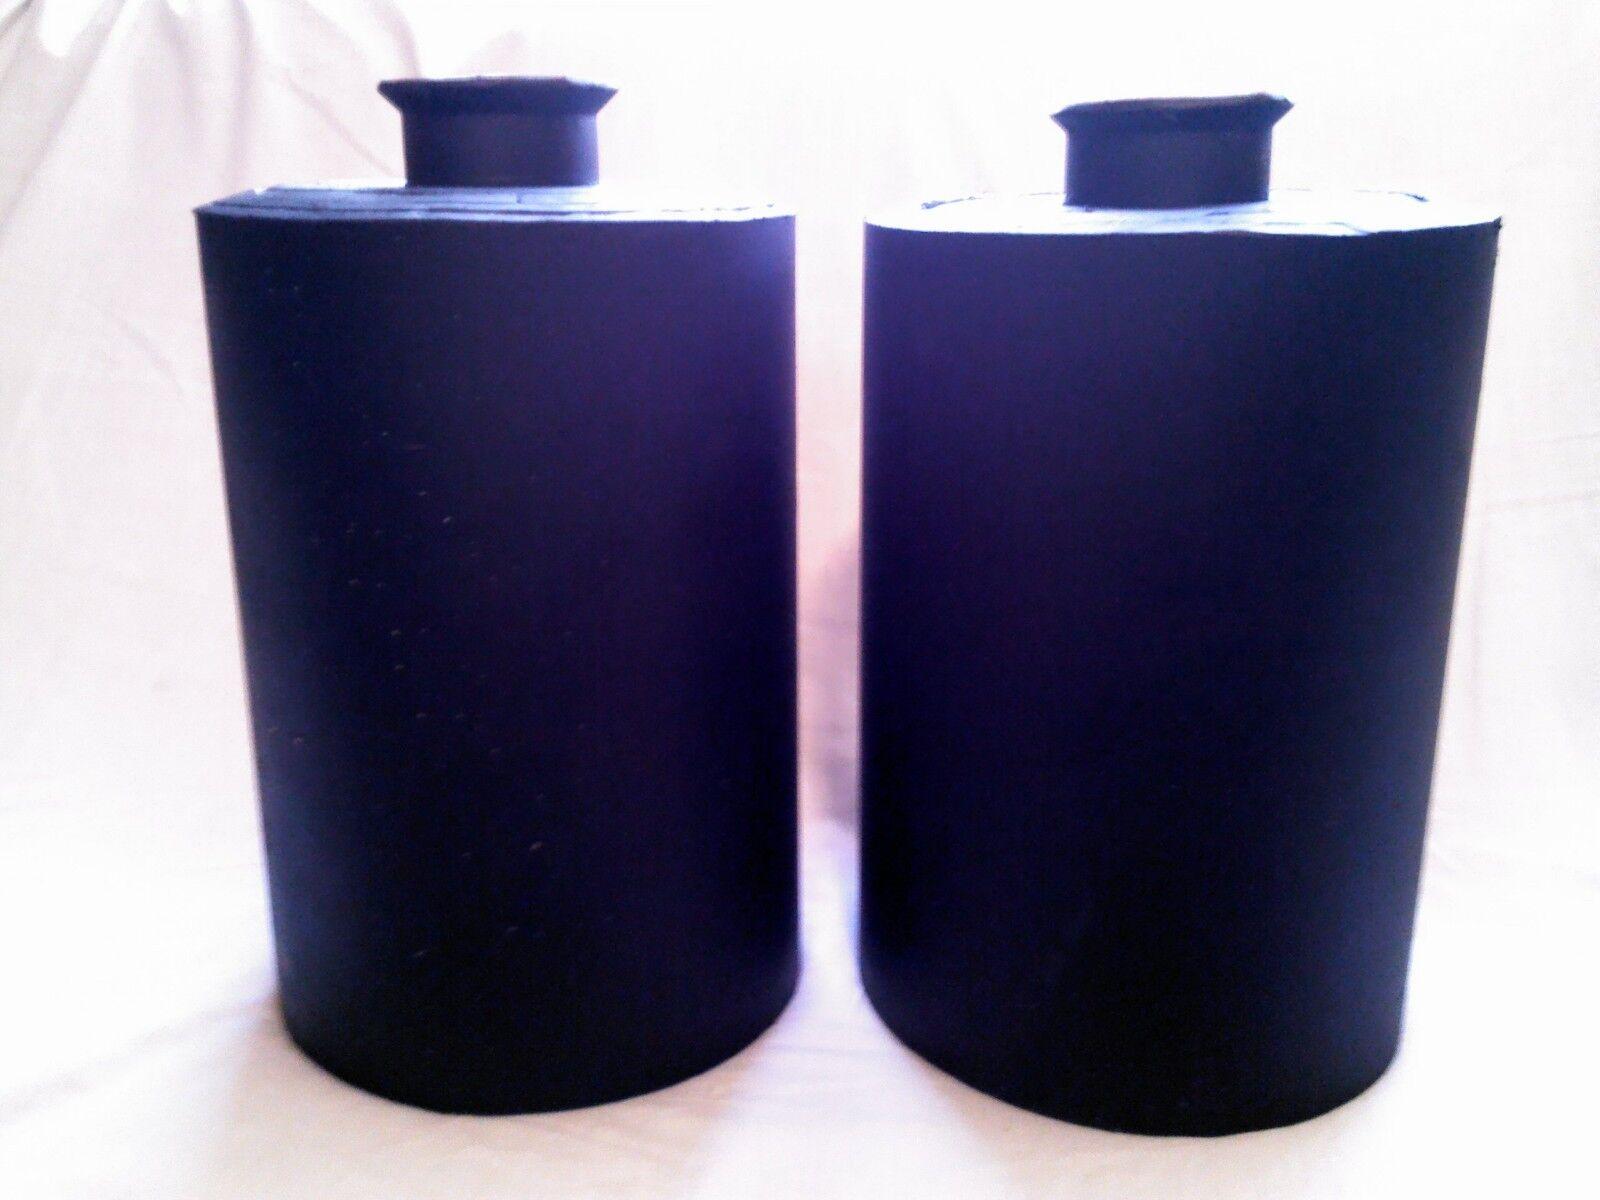 Nigiri Game XL (gripping jars) Martial Arts Weight Training (Hojo Undo) Karate